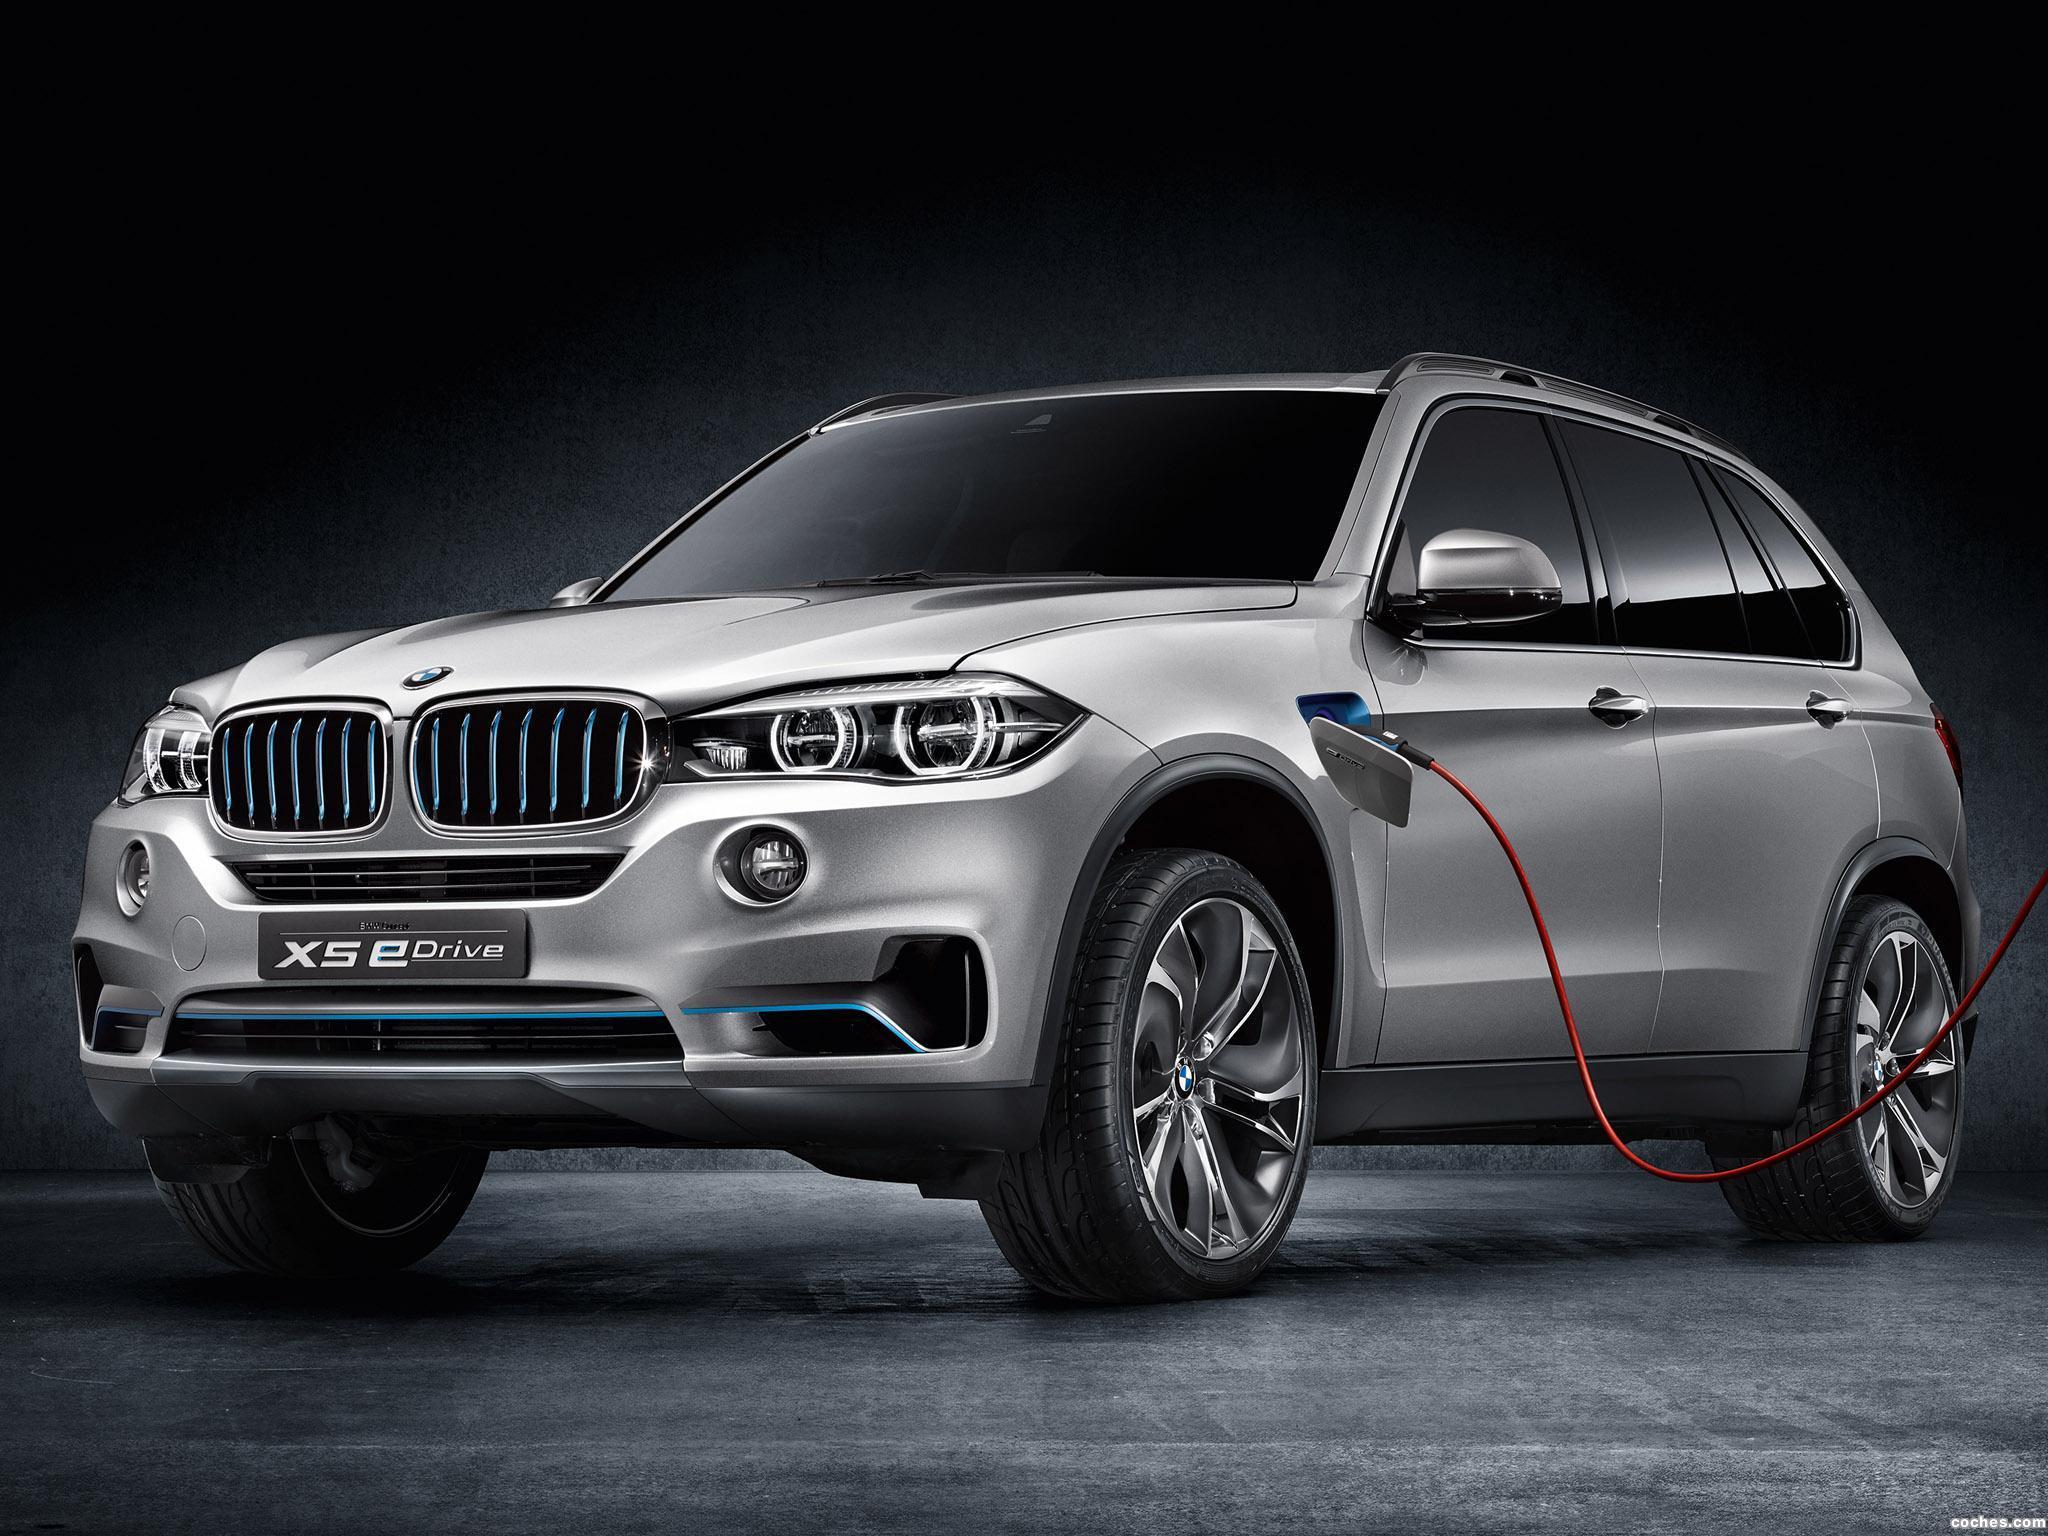 Foto 0 de BMW X5 eDrive Concept 2013